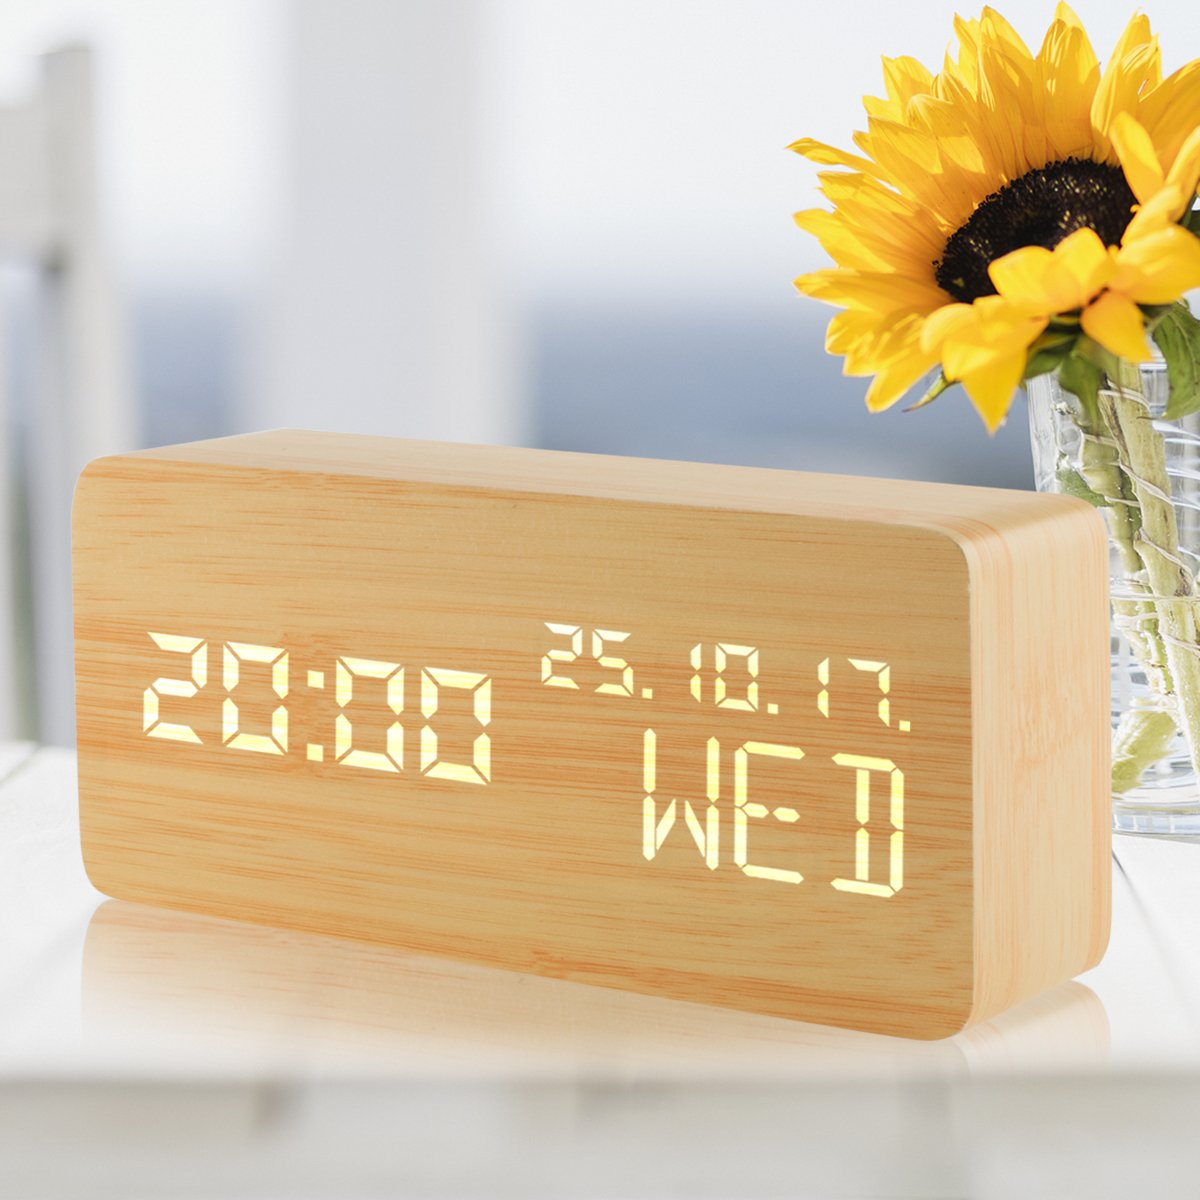 Reloj digital reloj despertador LED de madera con niveles Brillo ajustable grupos